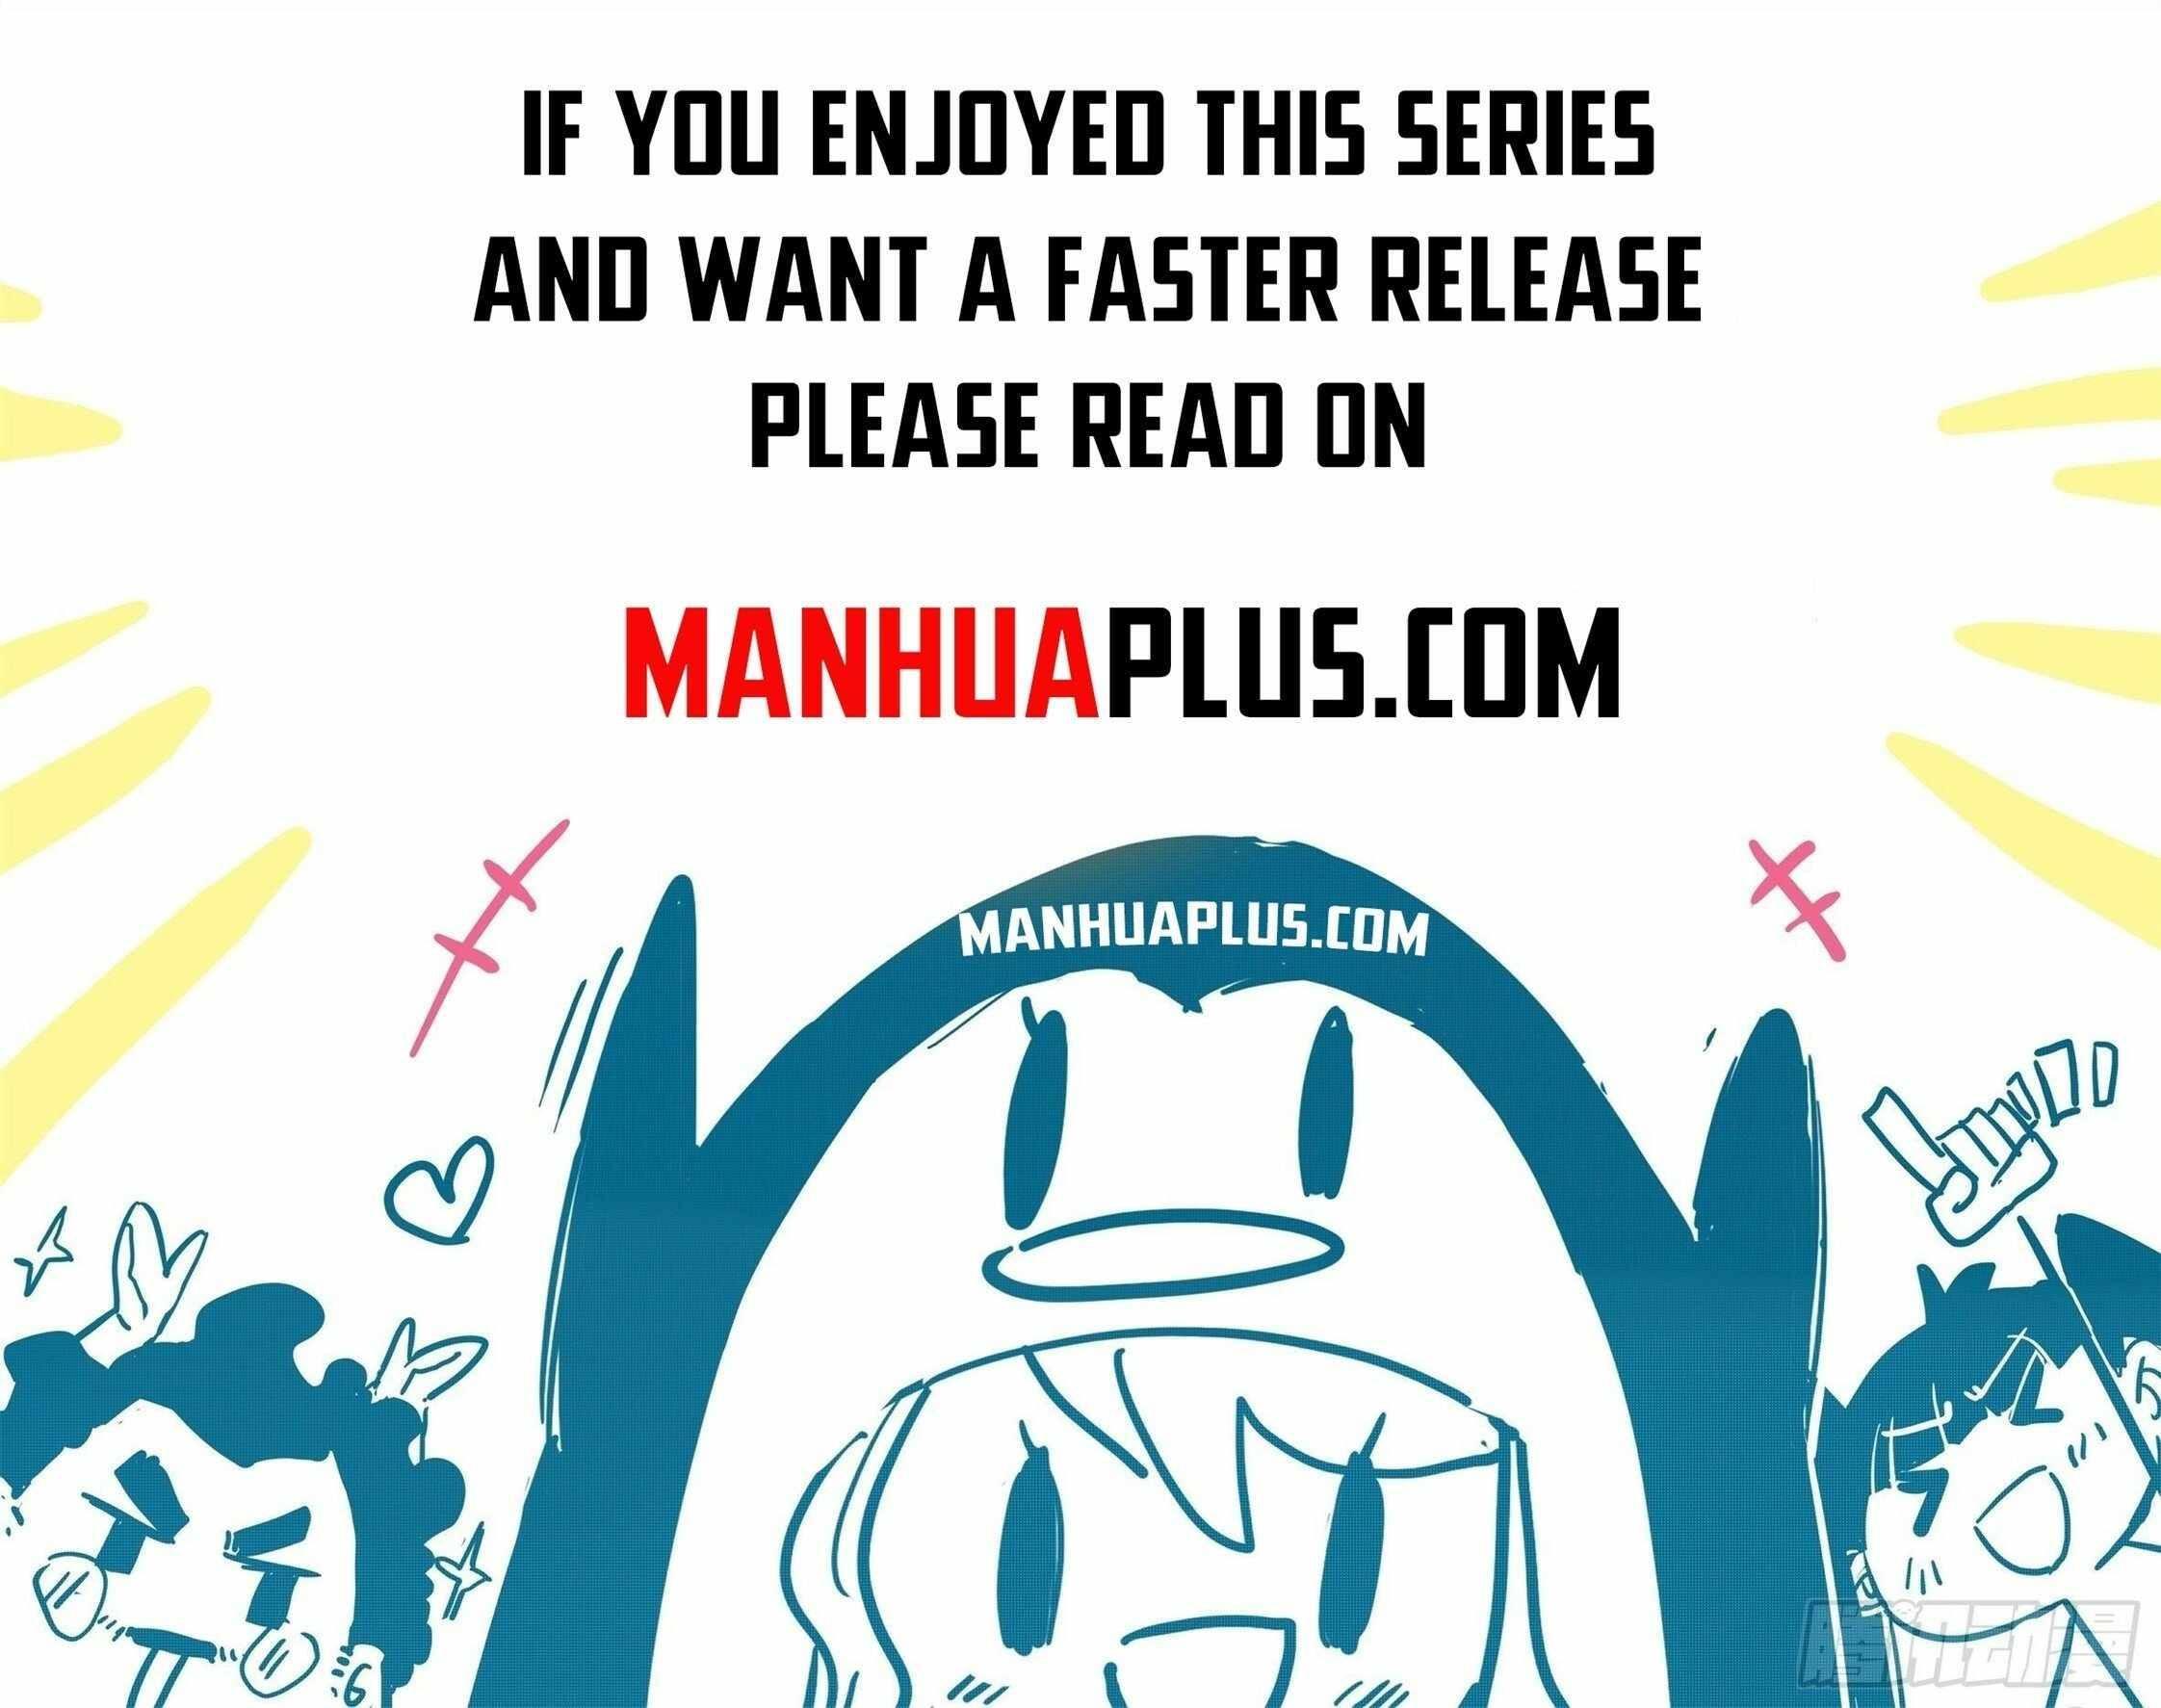 I'm The Great Immortal Chapter 339 page 1 - Mangakakalot